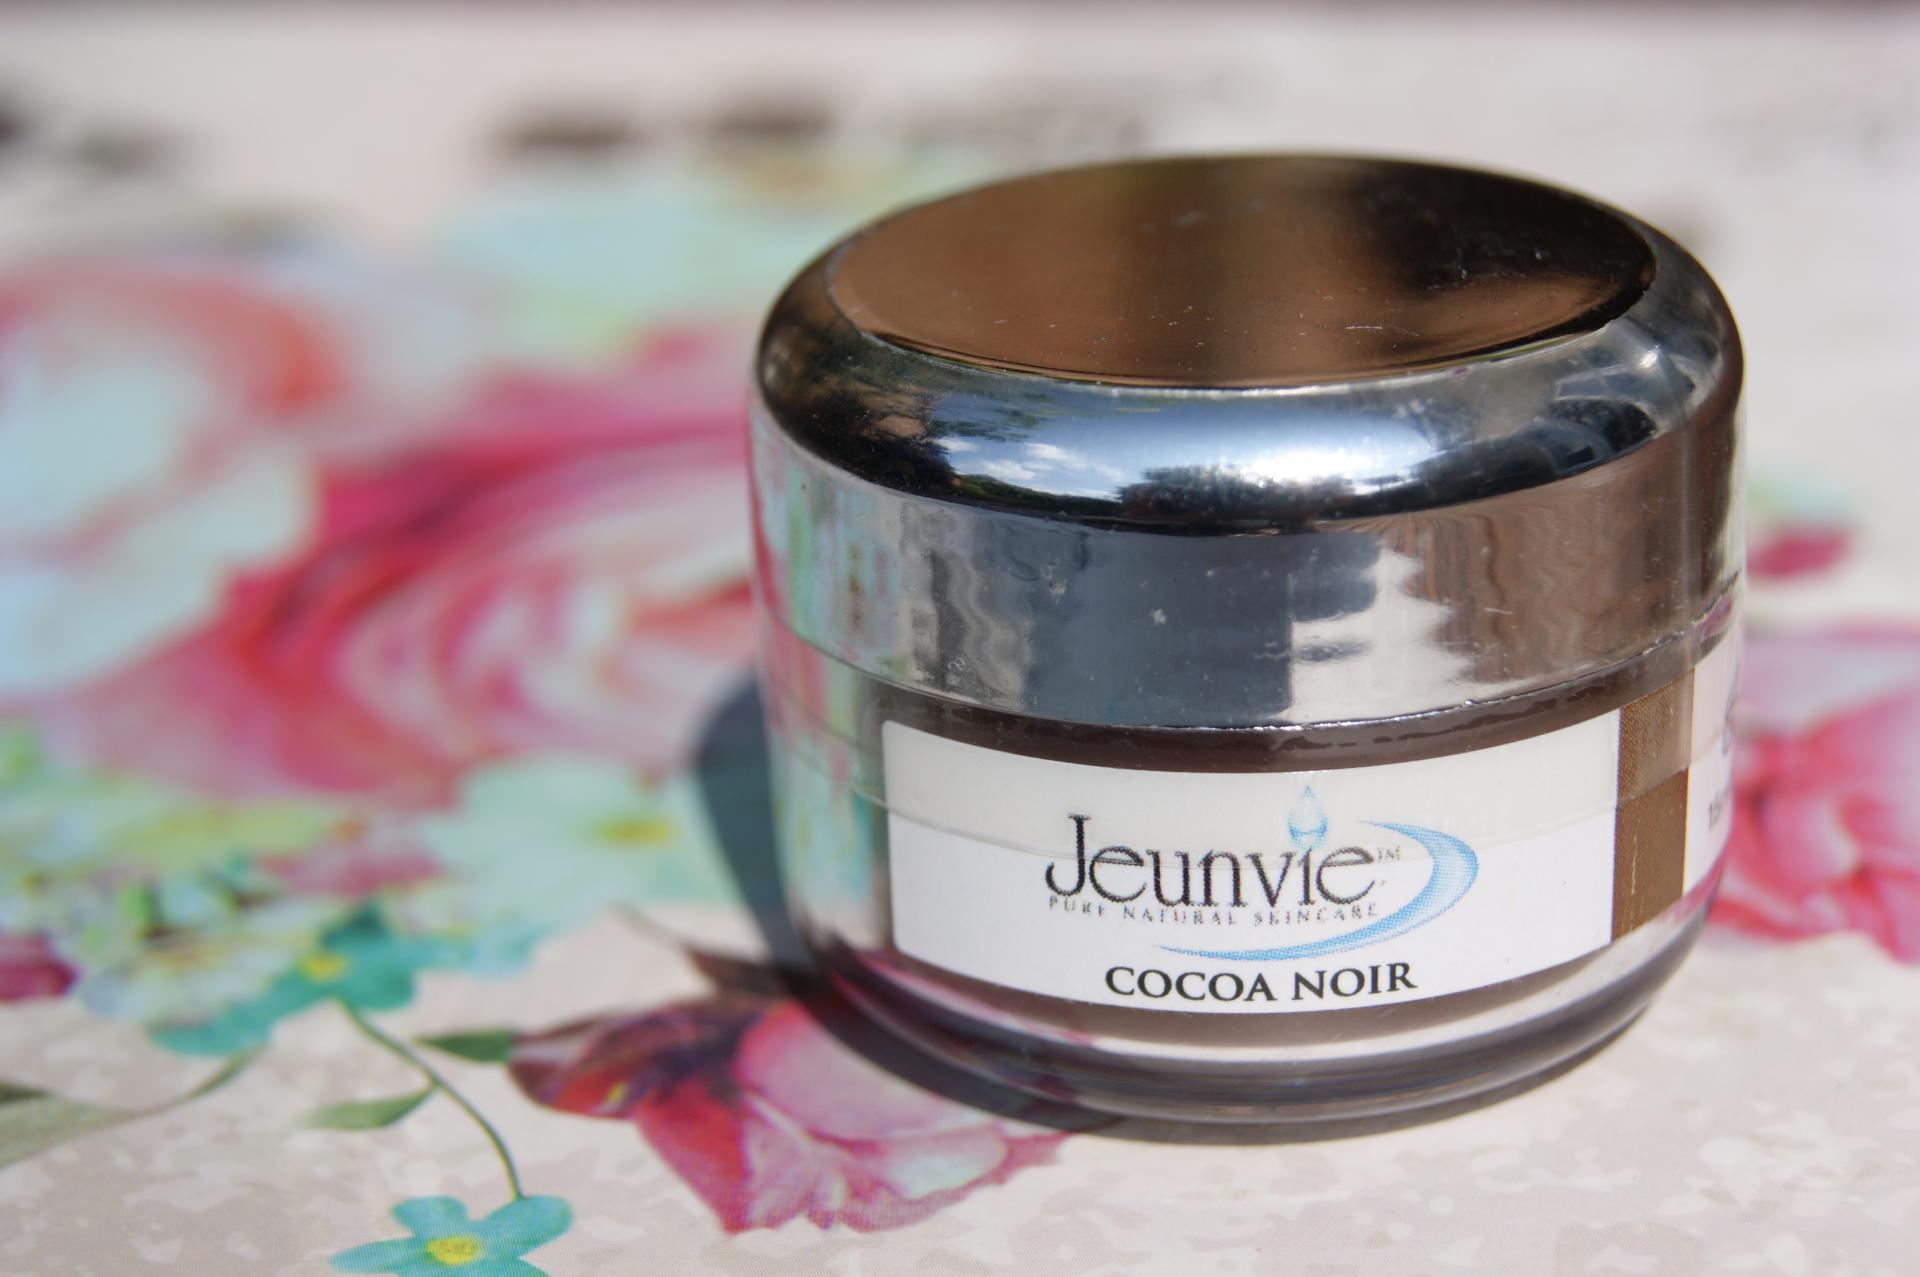 Jeunvie - Cocoa Noir Lip Balm